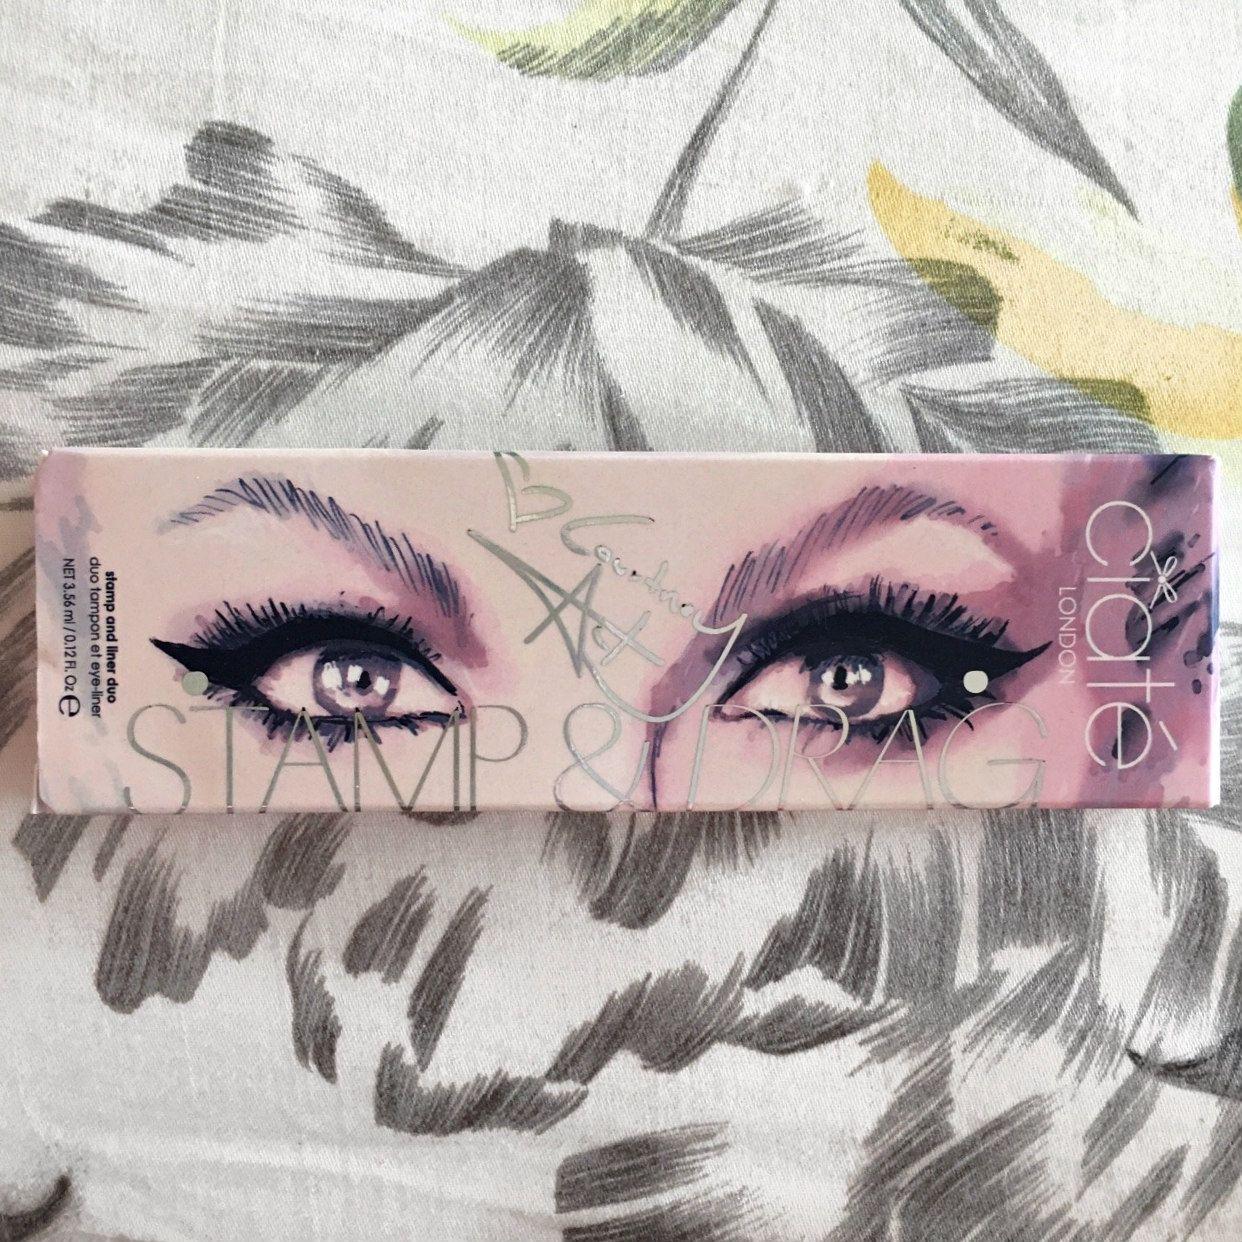 Ciaté London x Courtney Act Stamp & Drag Liner Duo